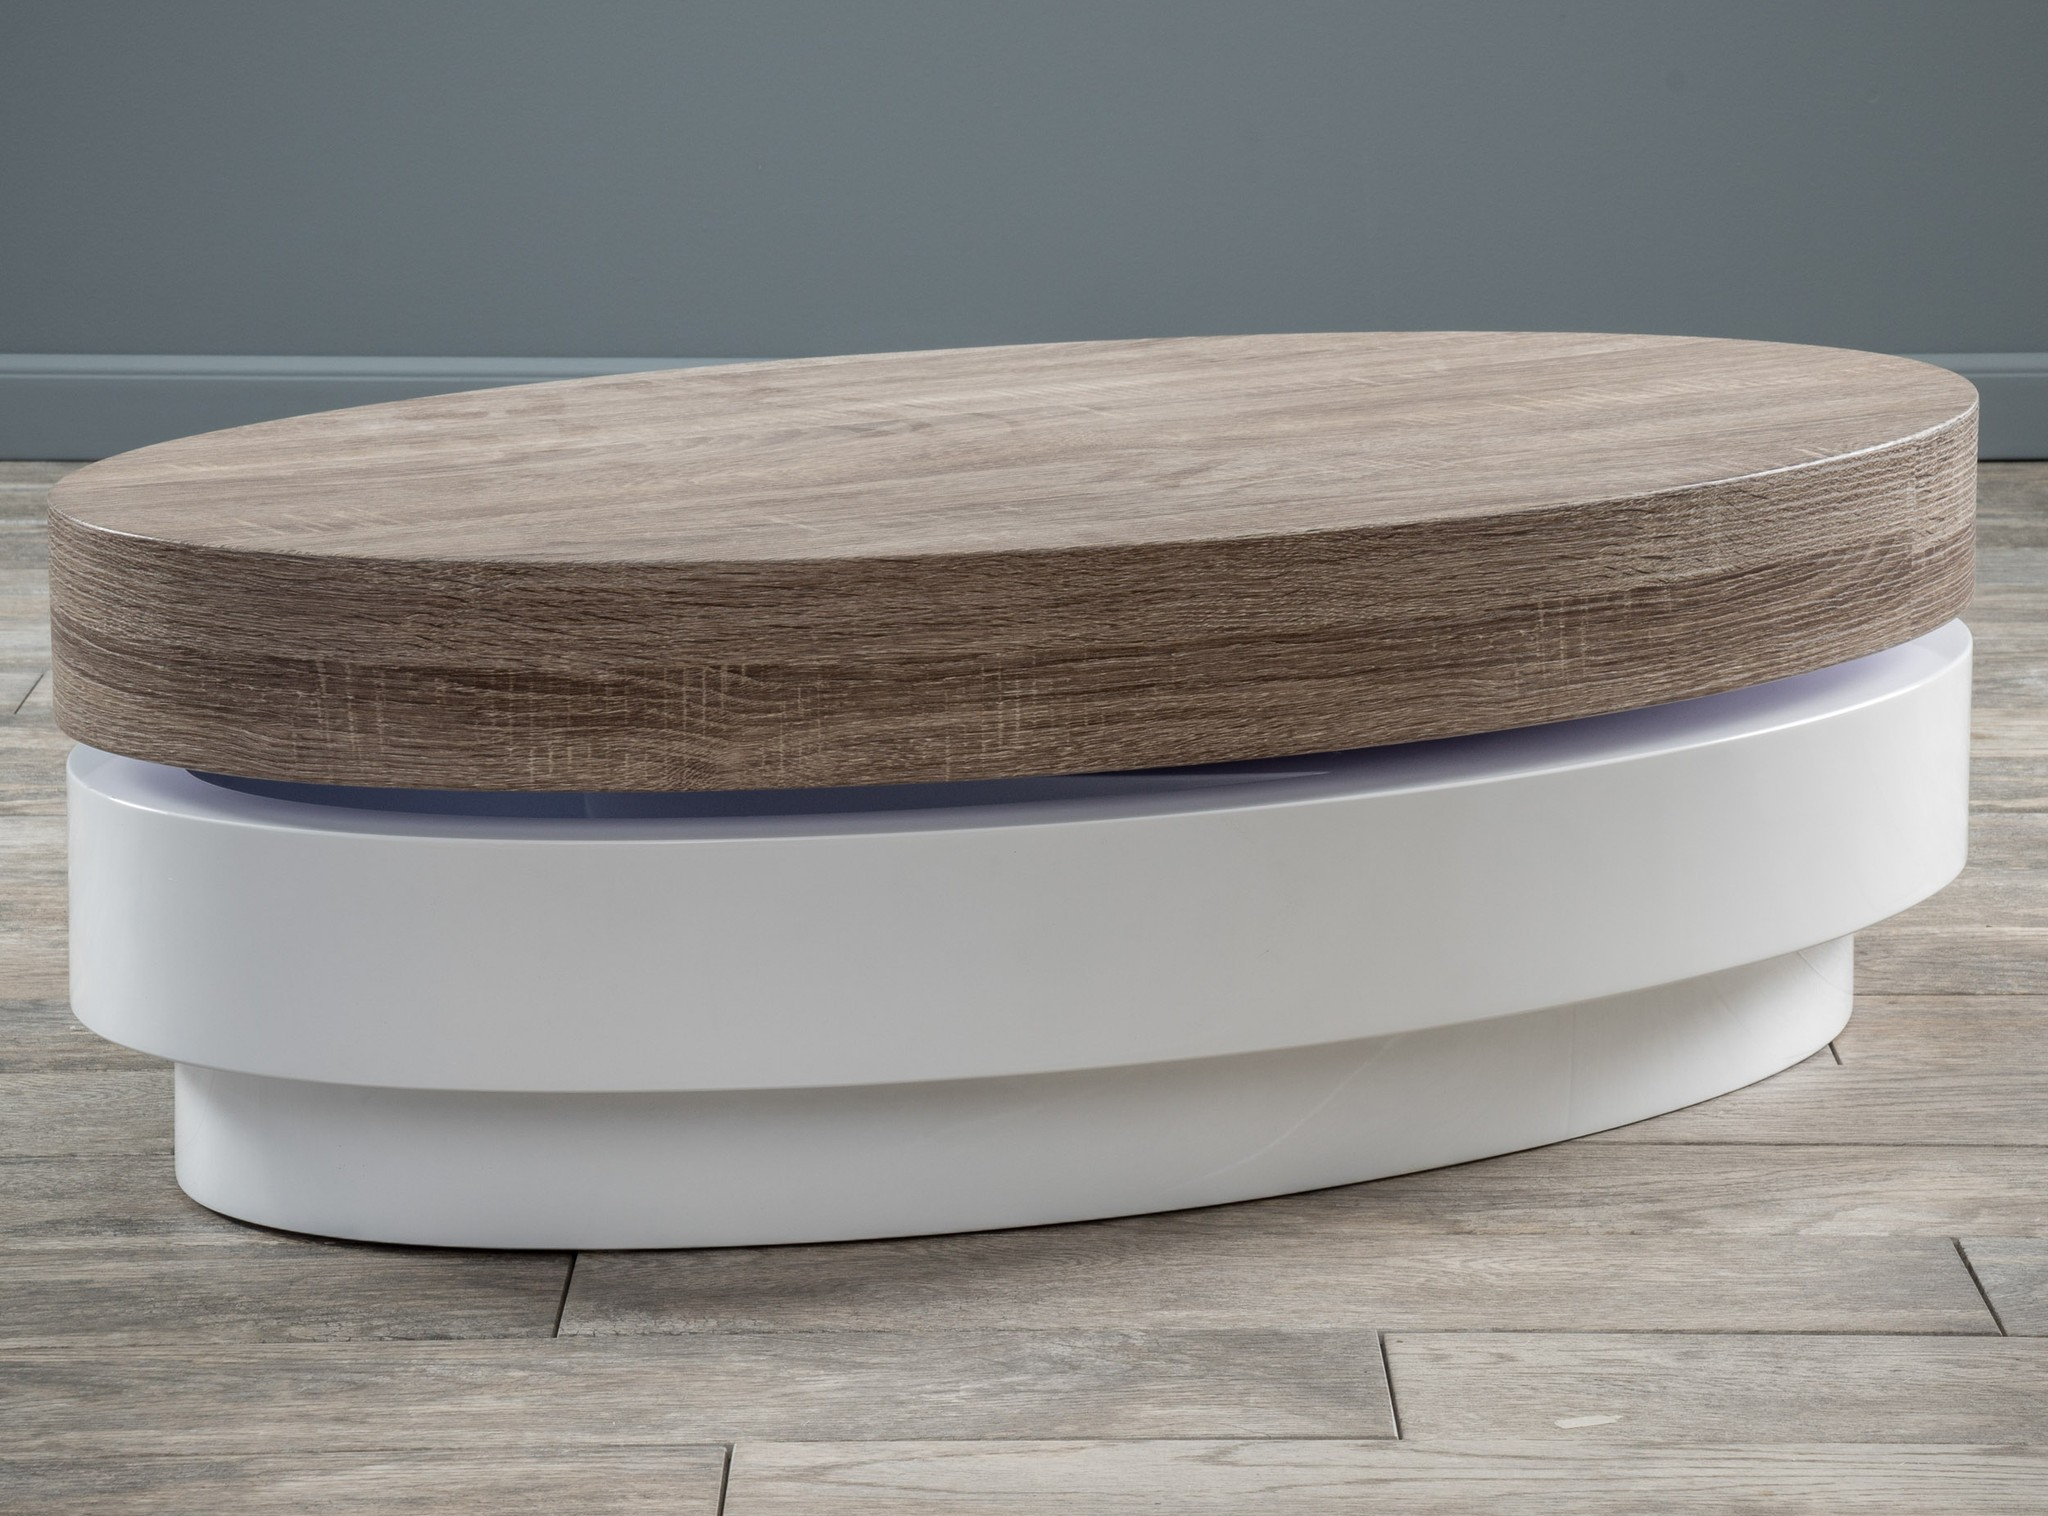 Oval Swivel Coffee Table